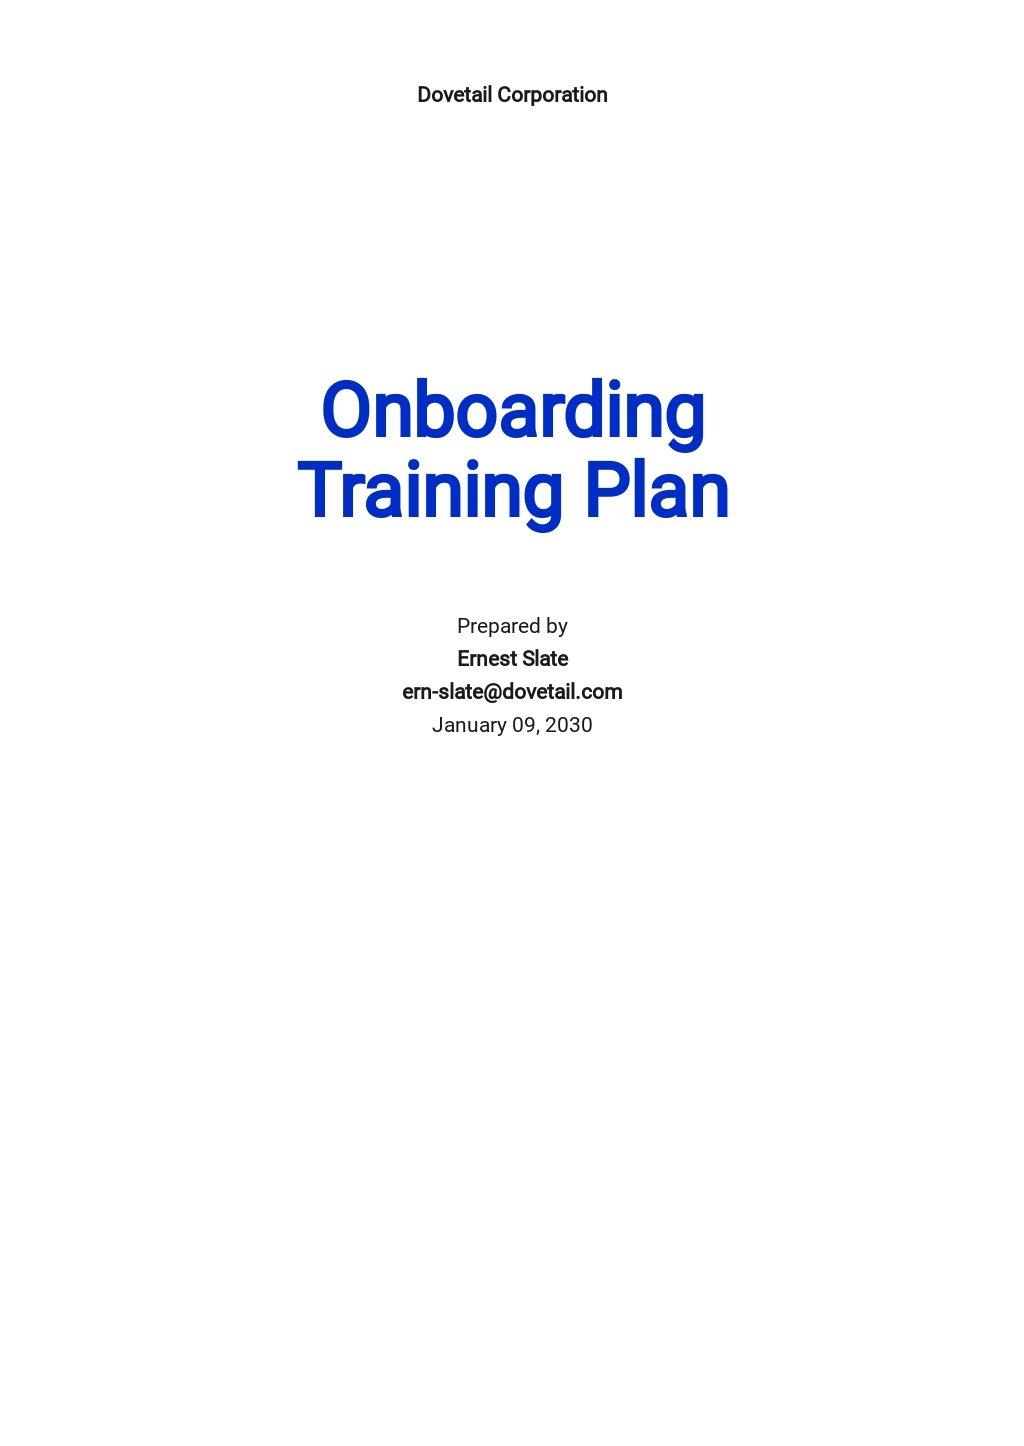 Onboarding Plan Template